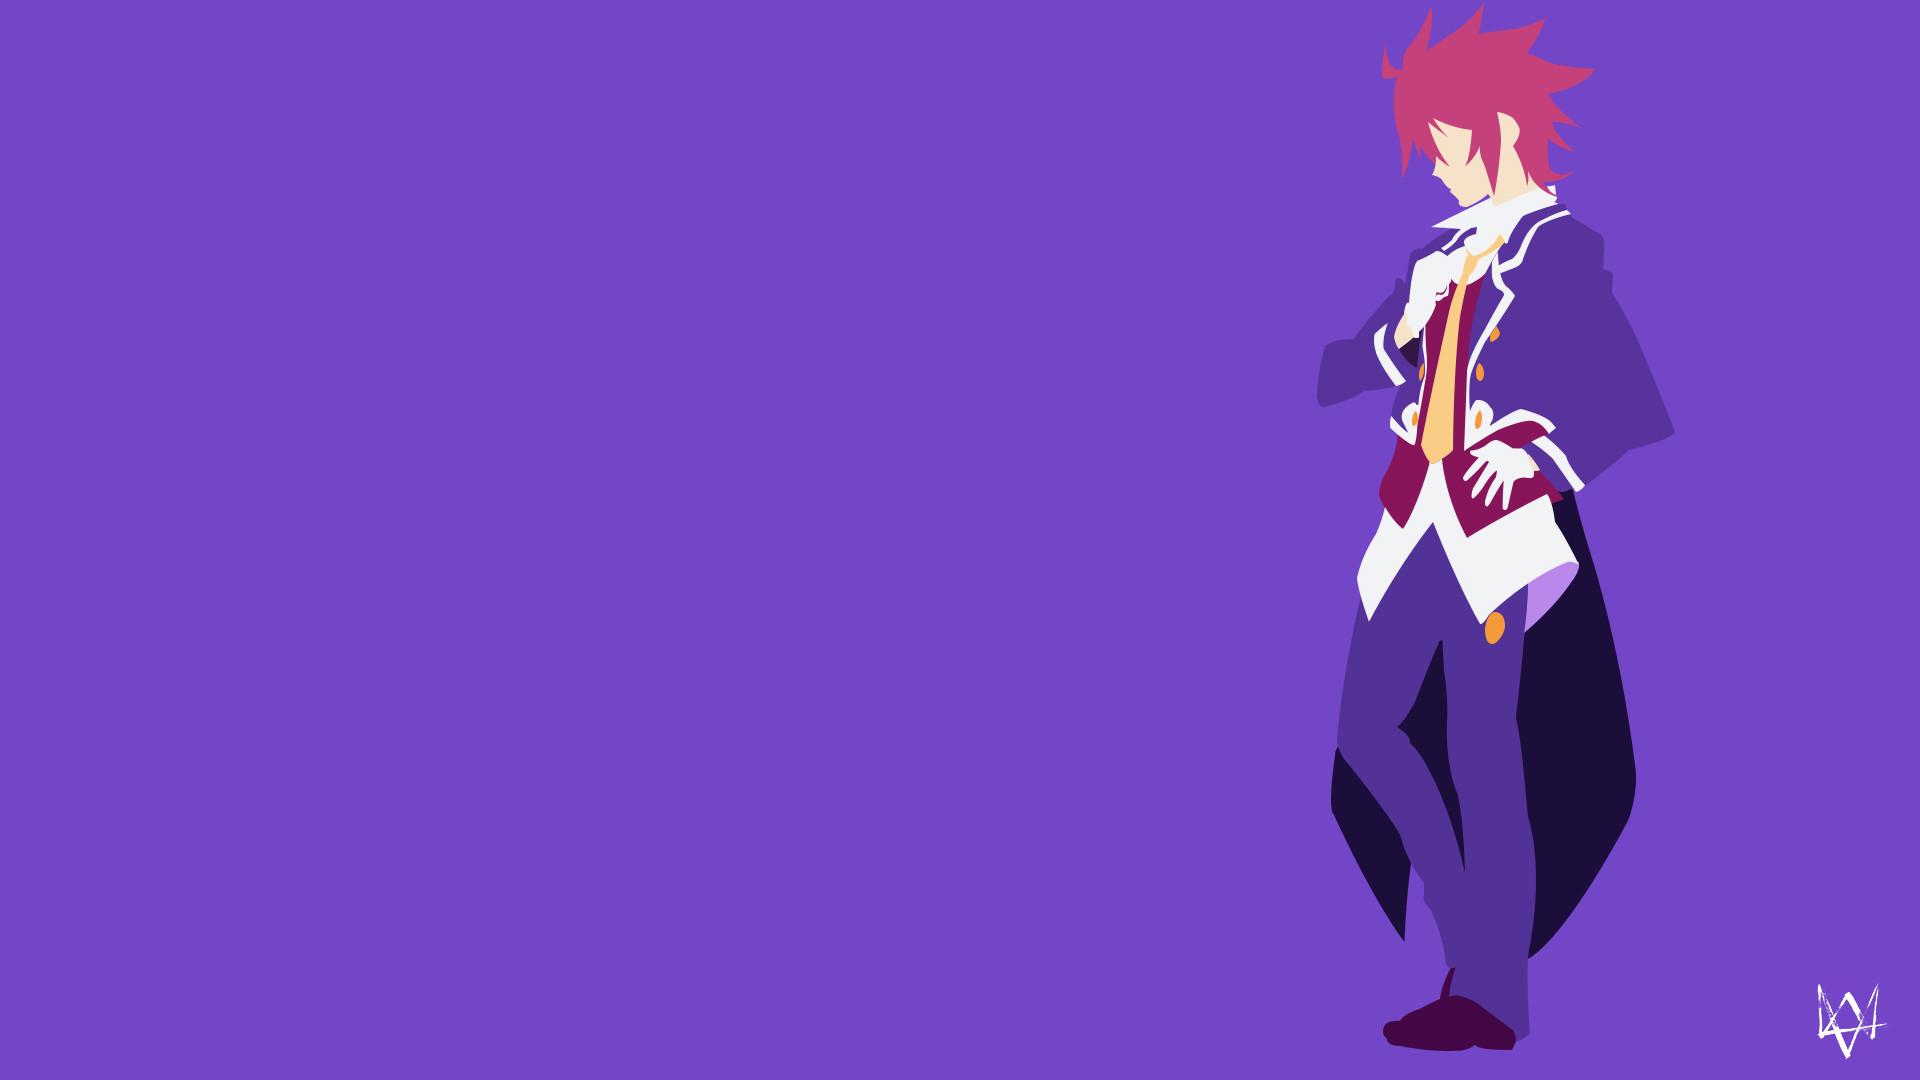 … Sora (No Game No Life) Minimalist Anime Wallpaper by Lucifer012